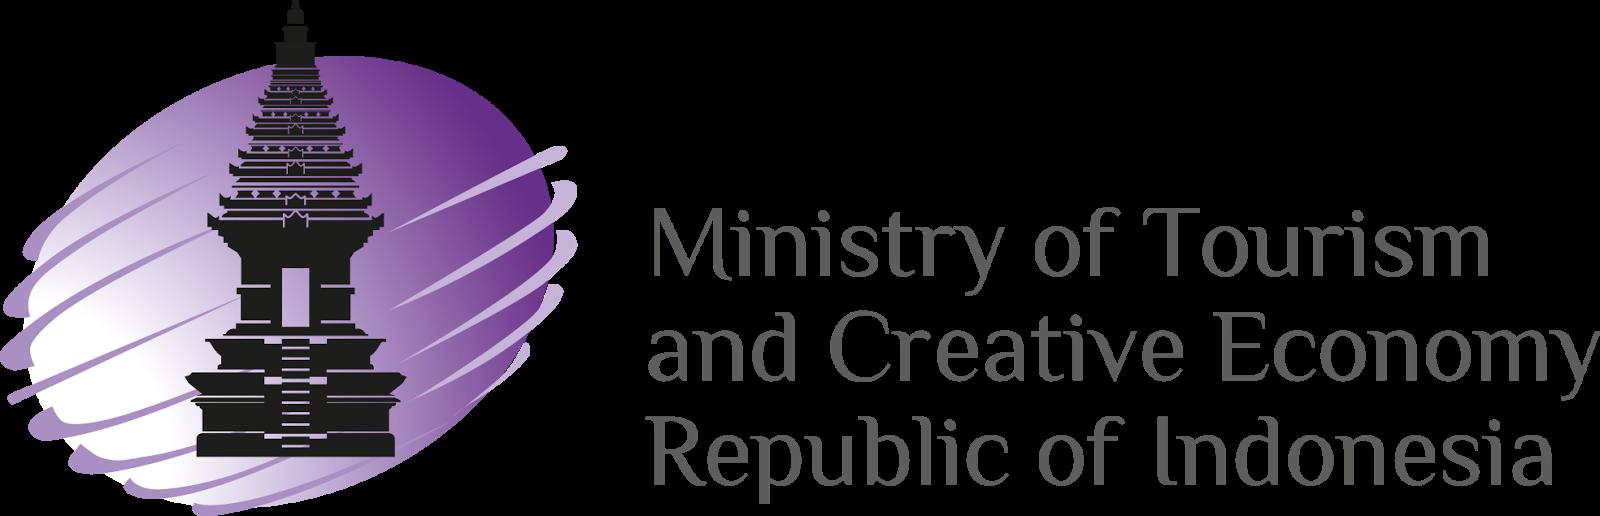 November 2015  237 Design  Logo Design